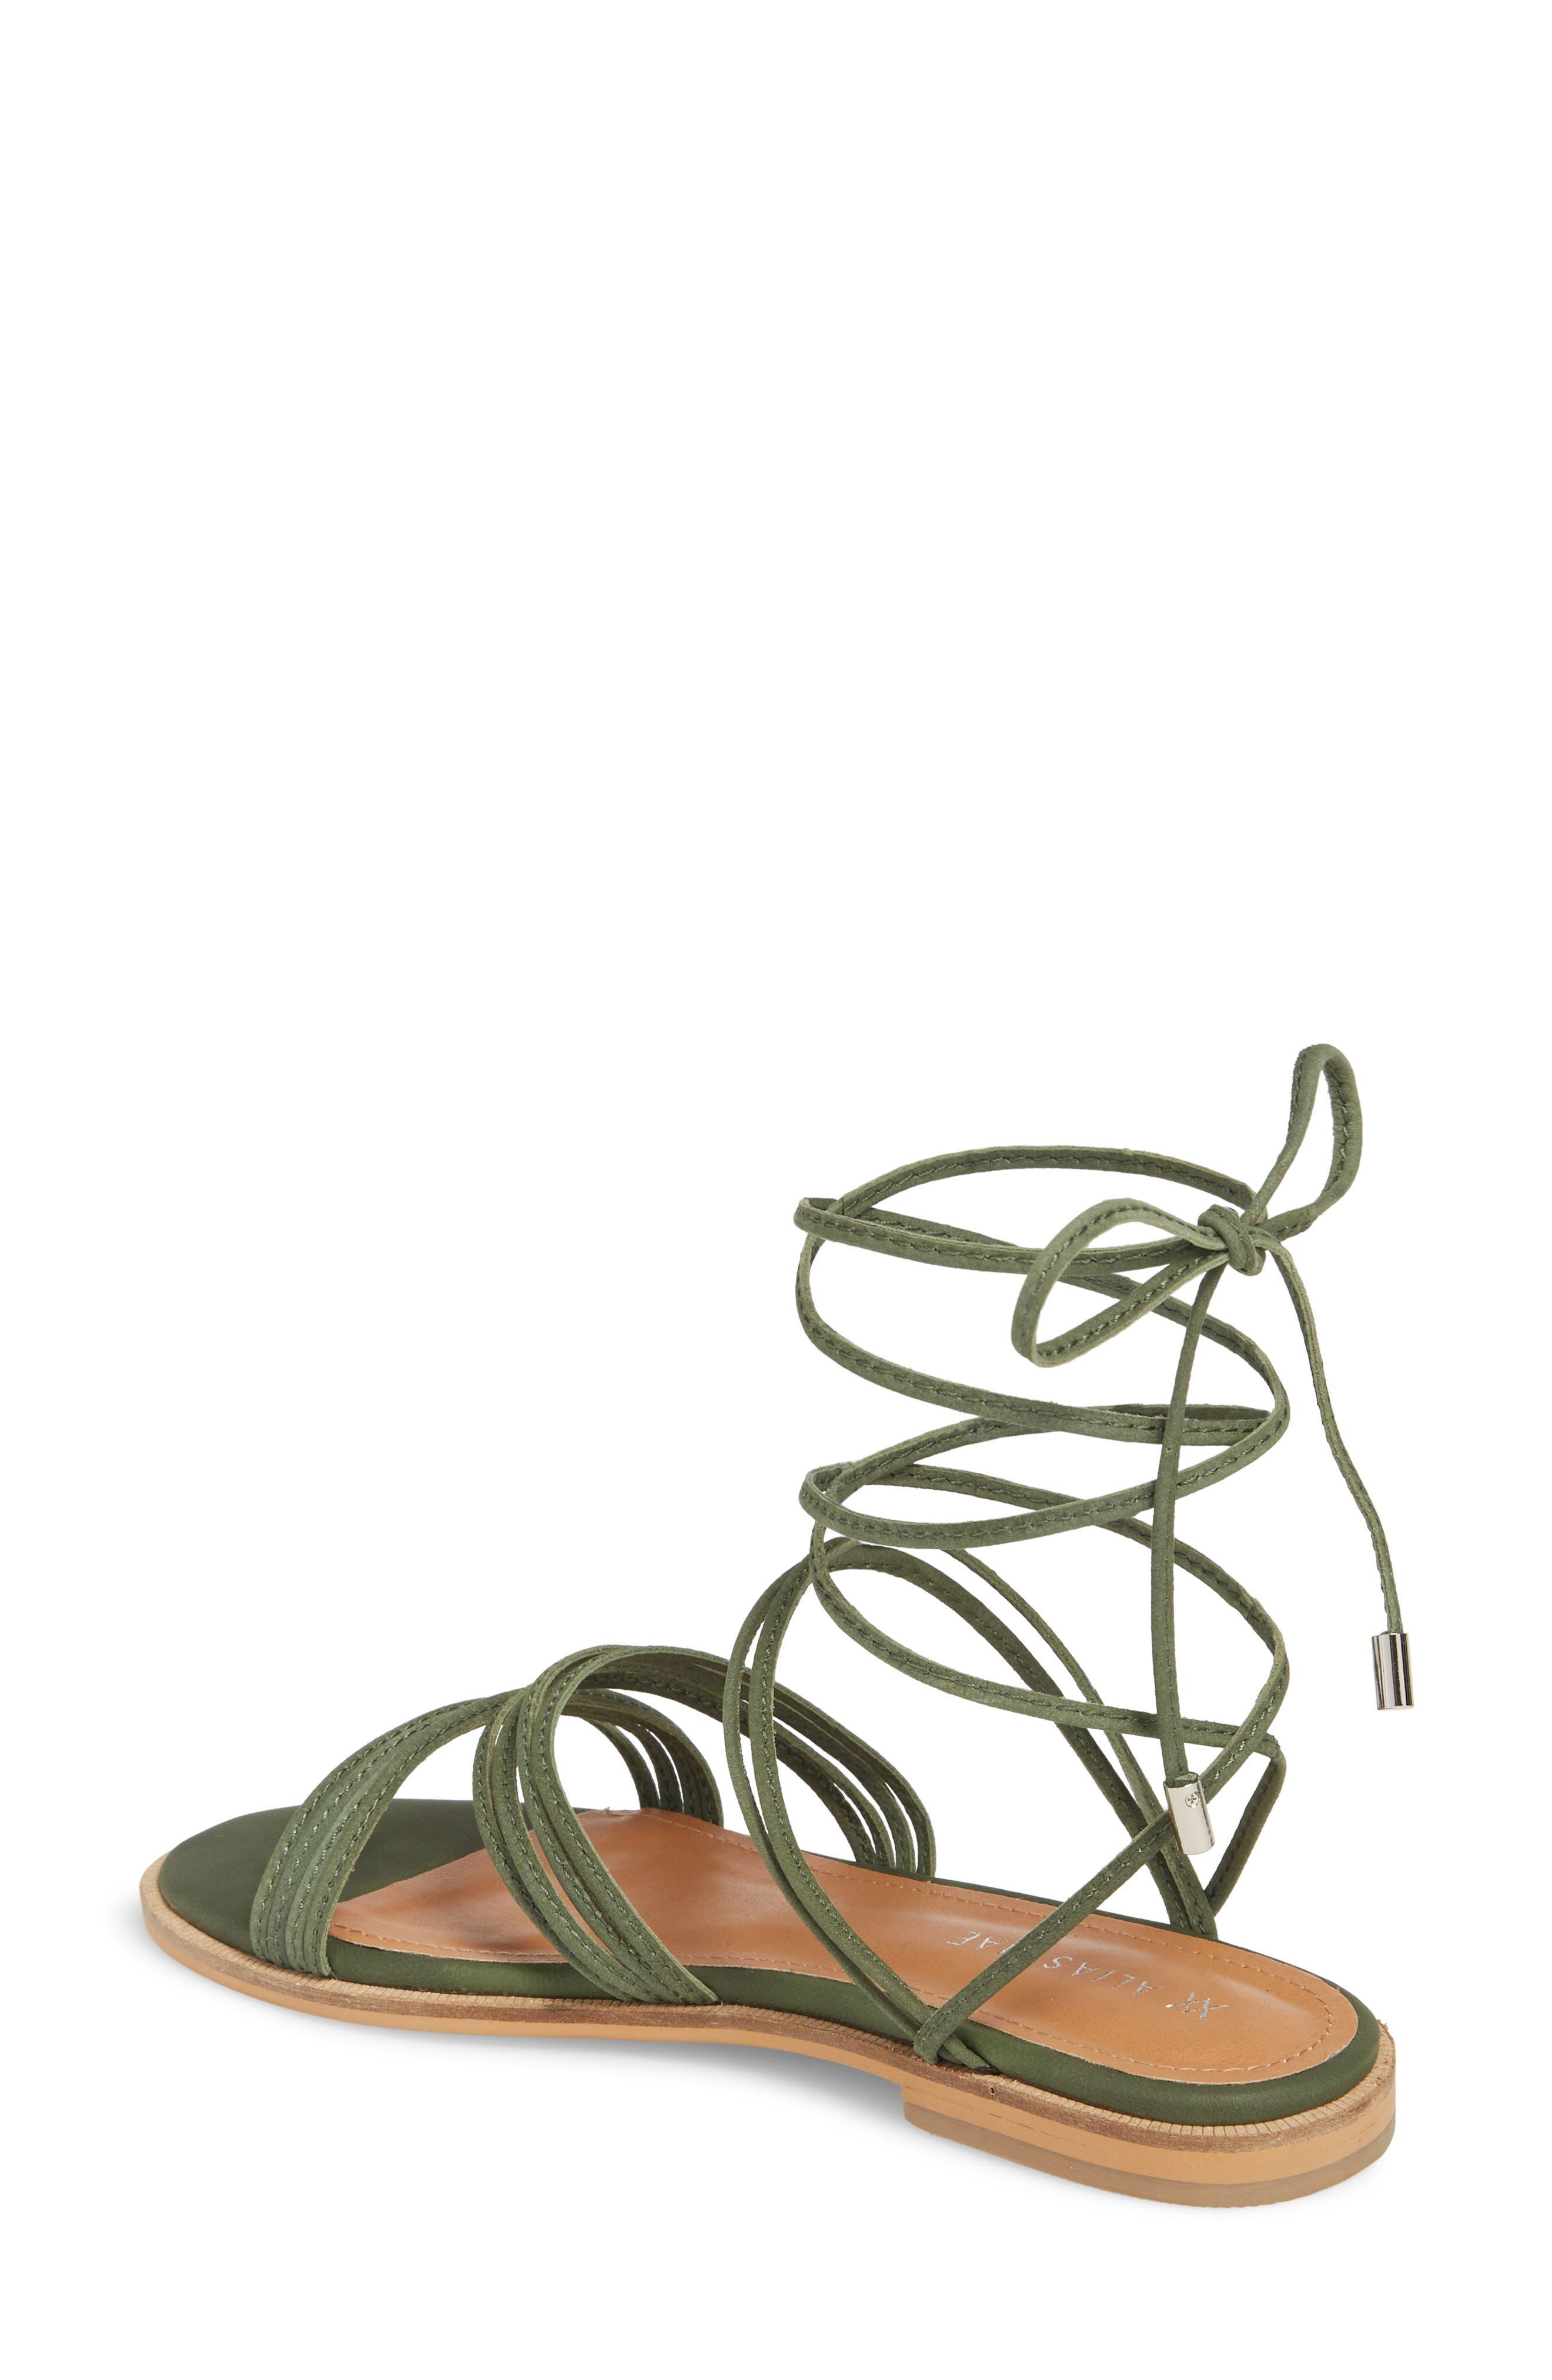 Theory Strappy Flat Sandal,                             Alternate thumbnail 2, color,                             Khaki Leather